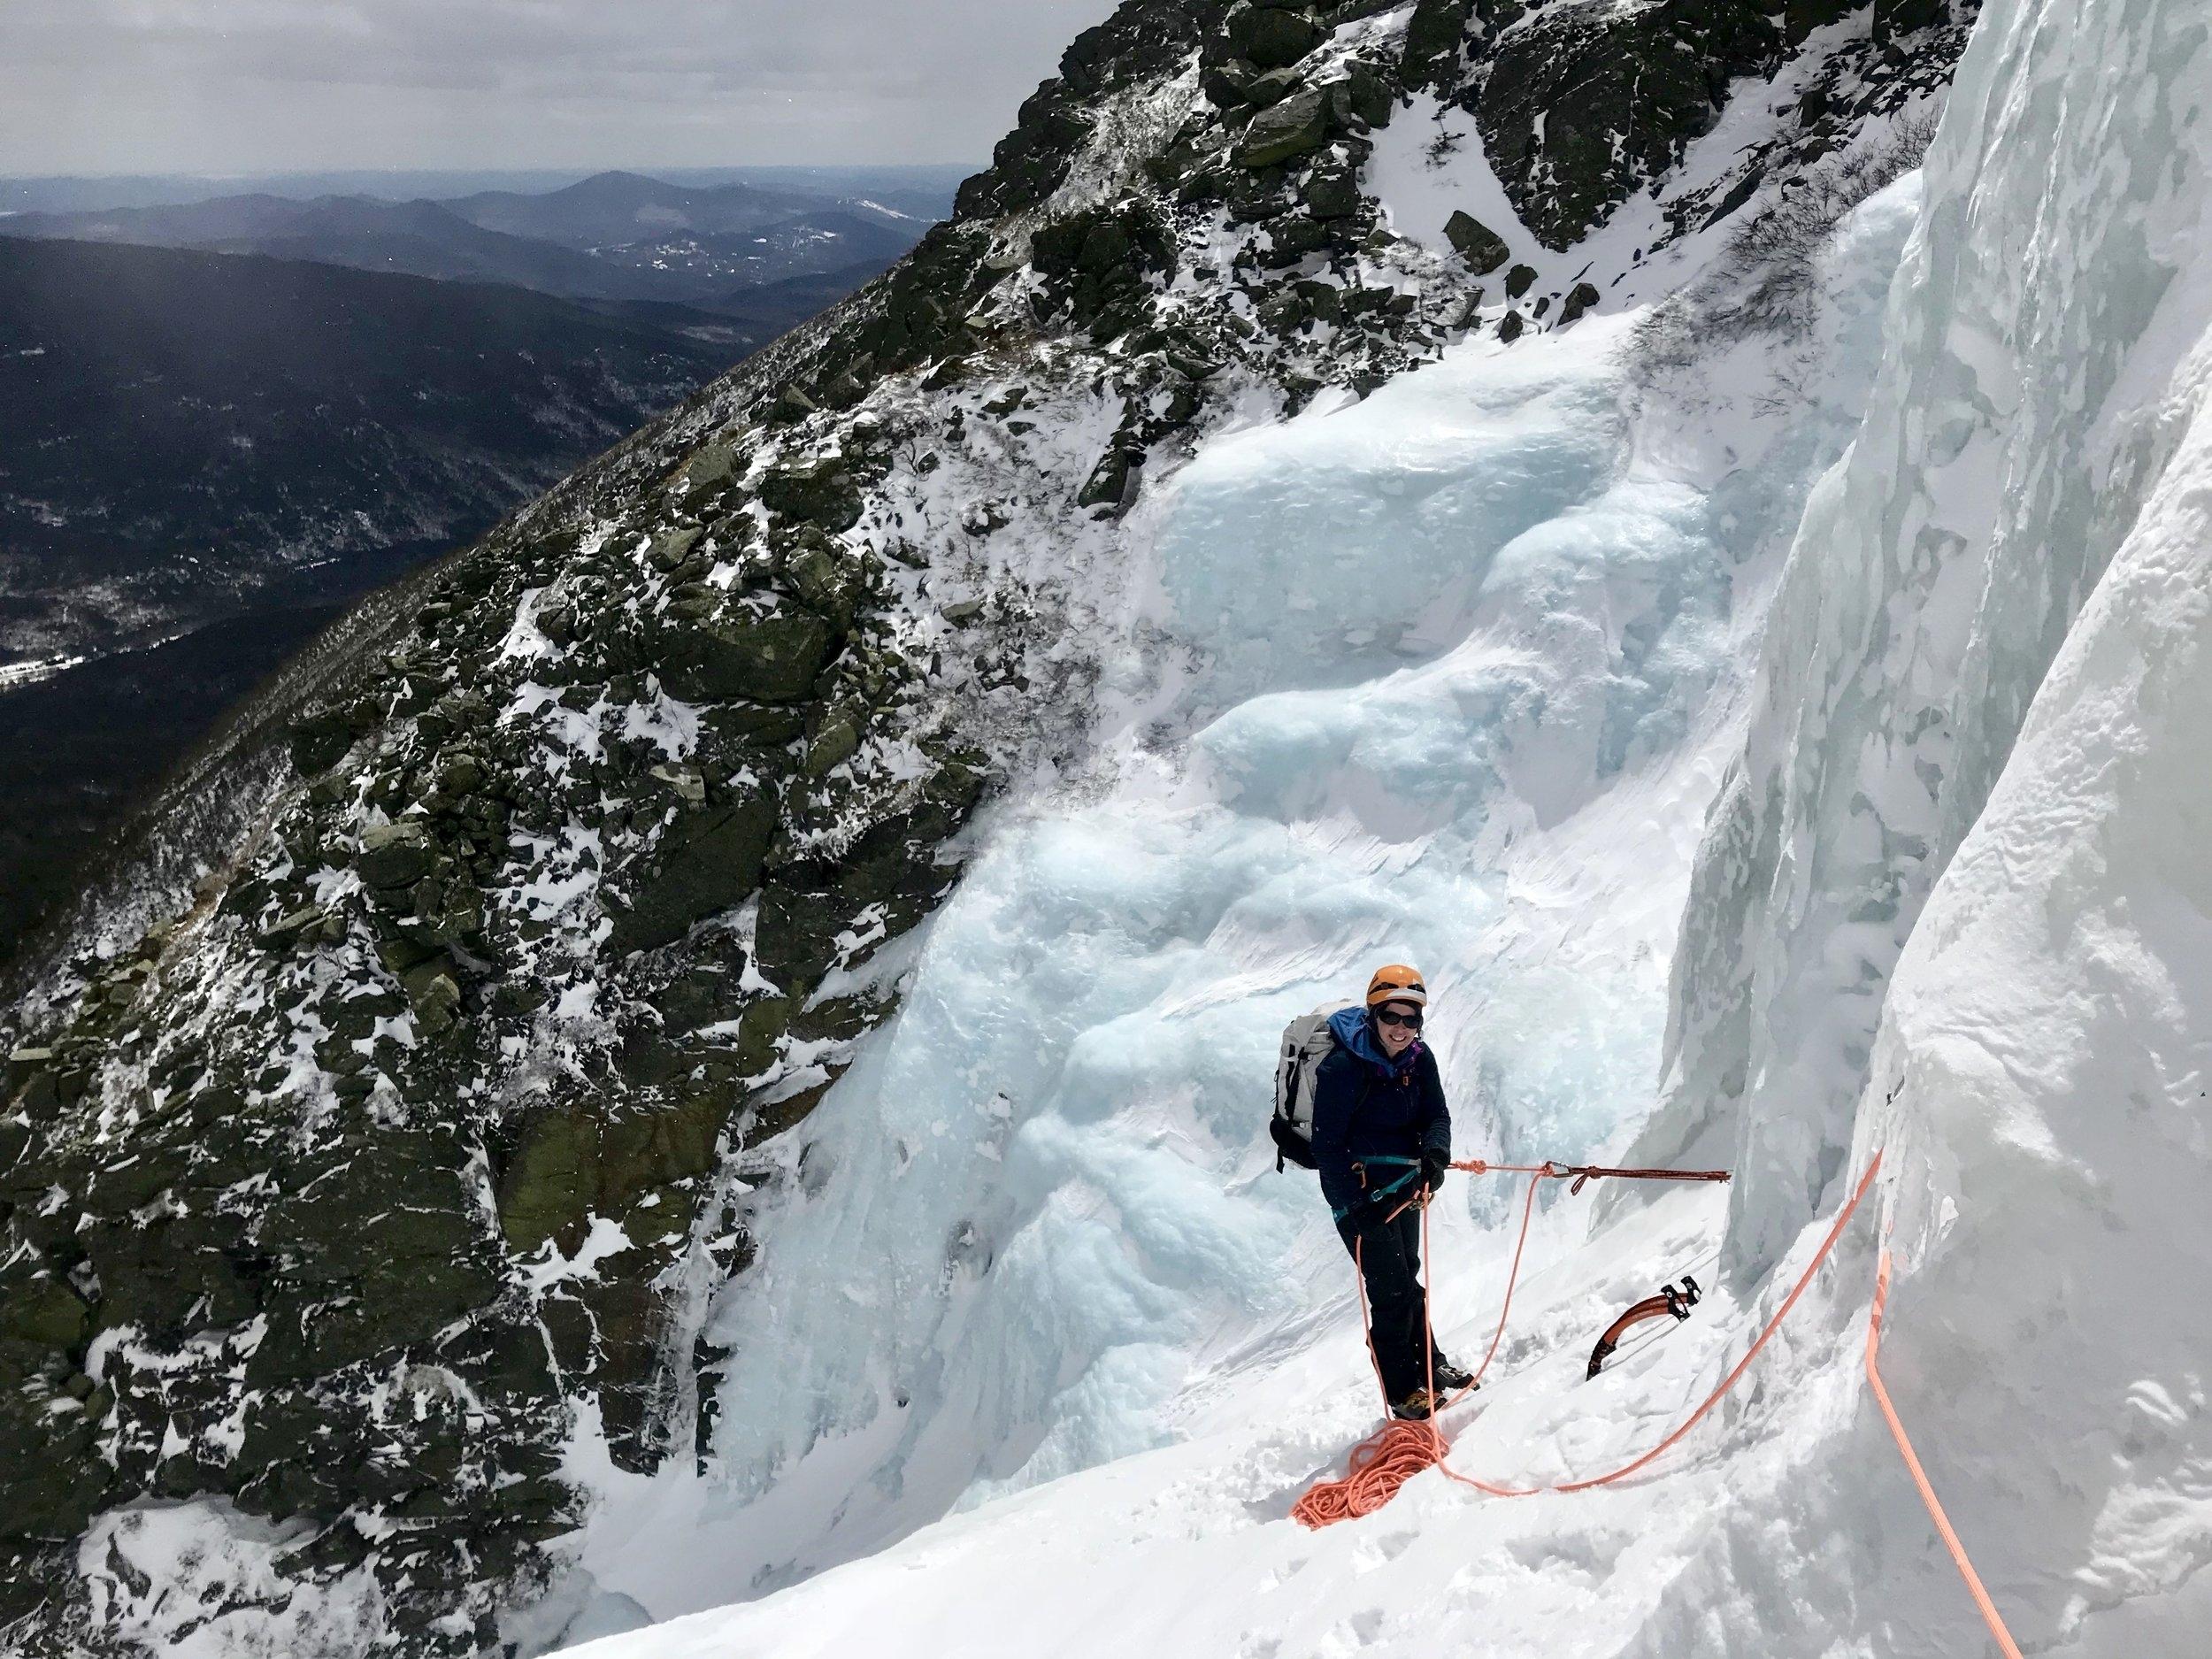 Grant Simmons New Hampshire Ice.jpeg